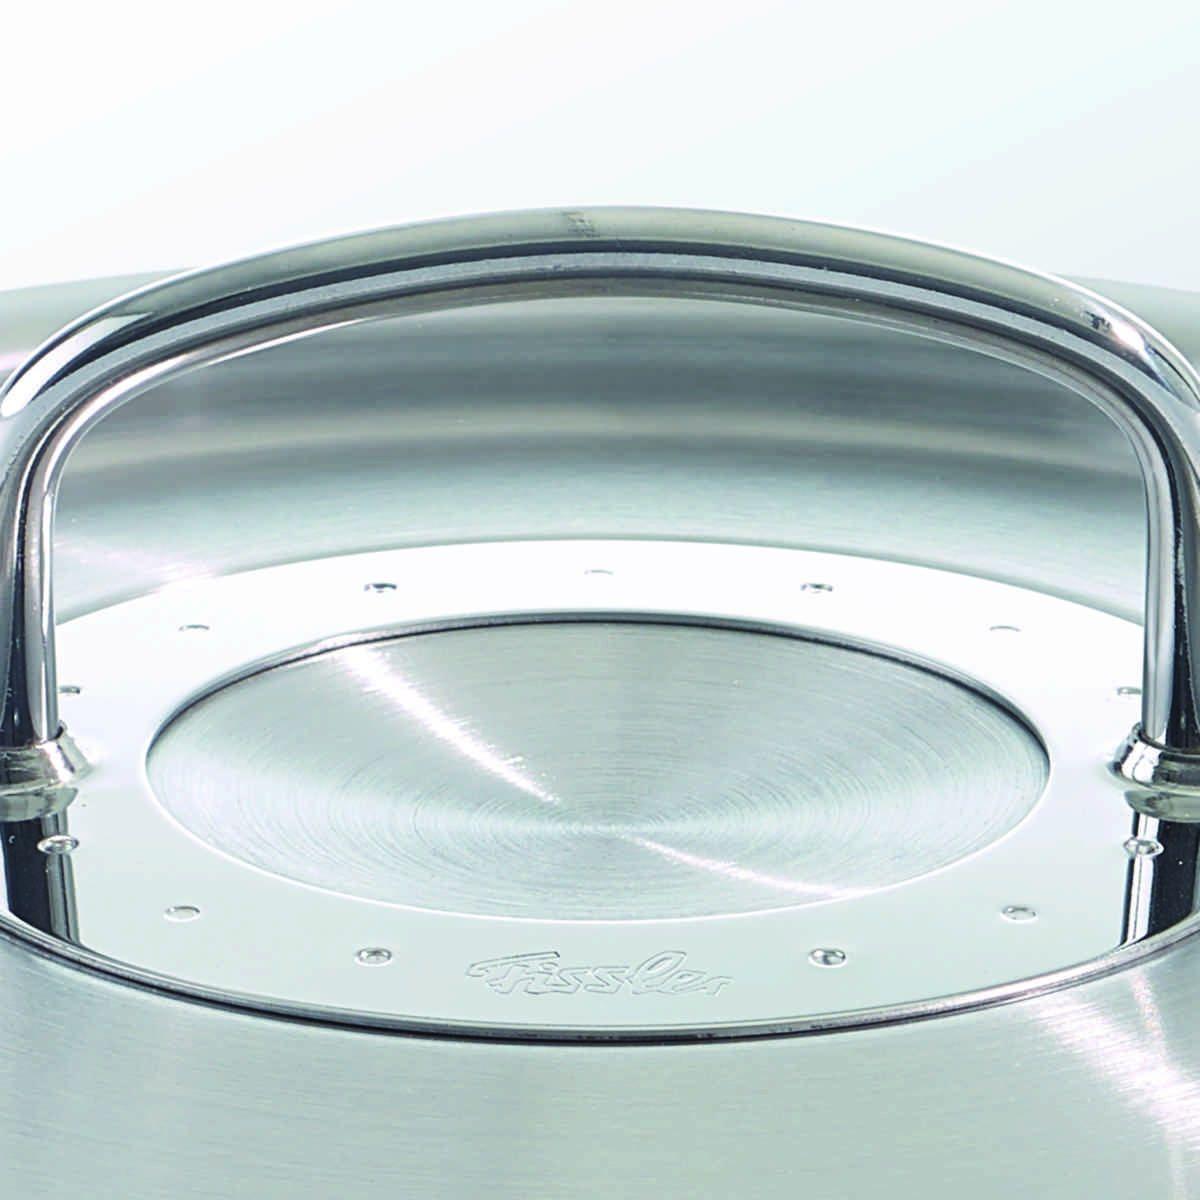 7-piece original-profi collection Stainless Steel Cookware Set